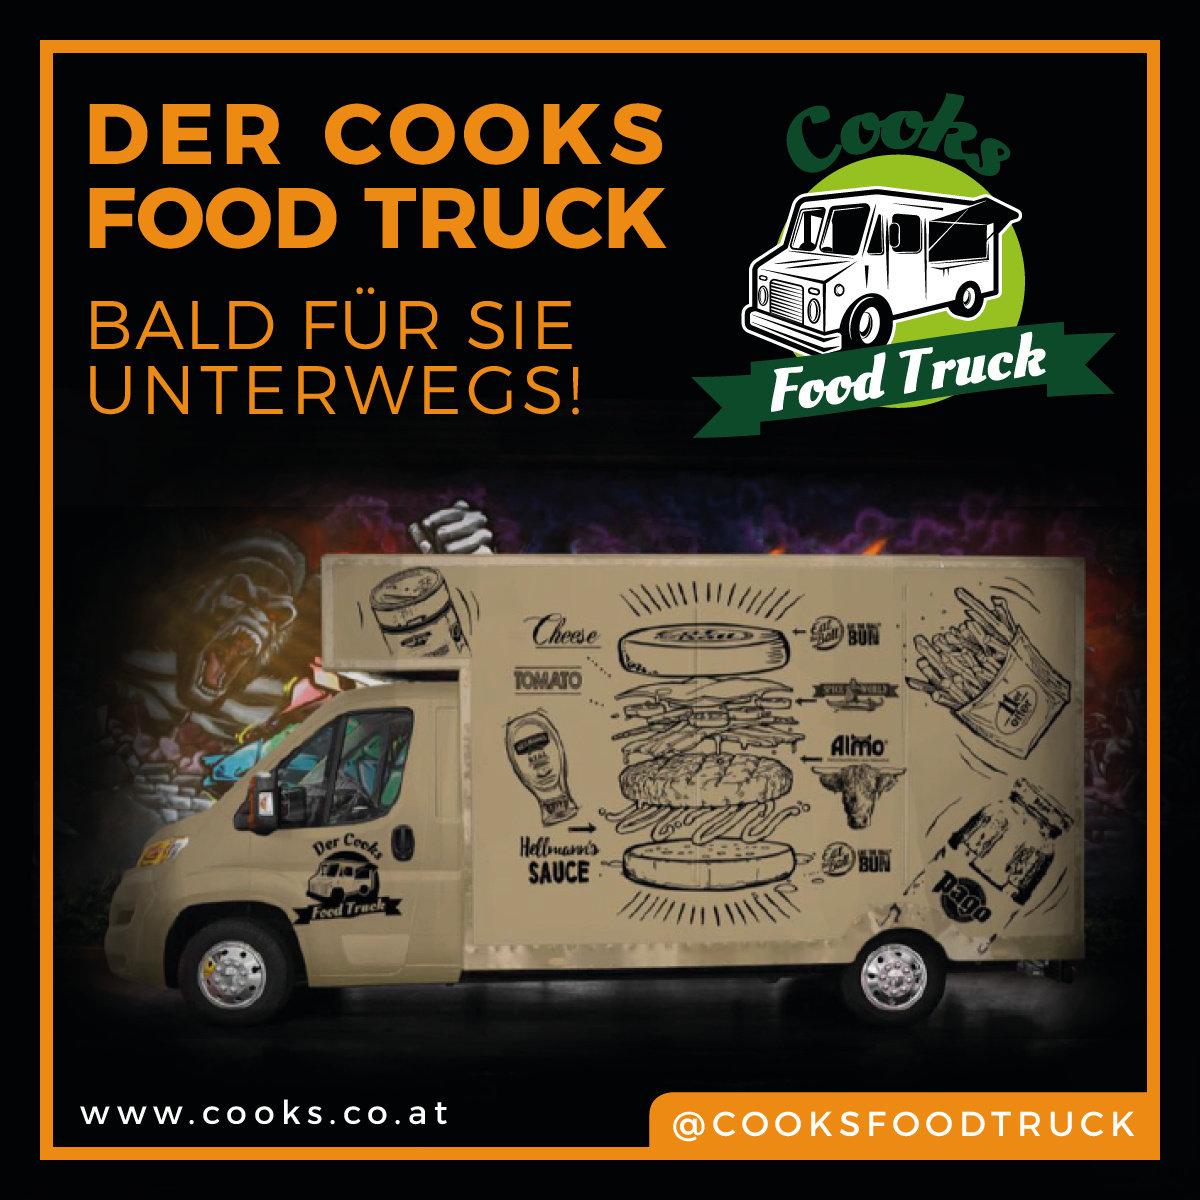 Food Truck Reservierung